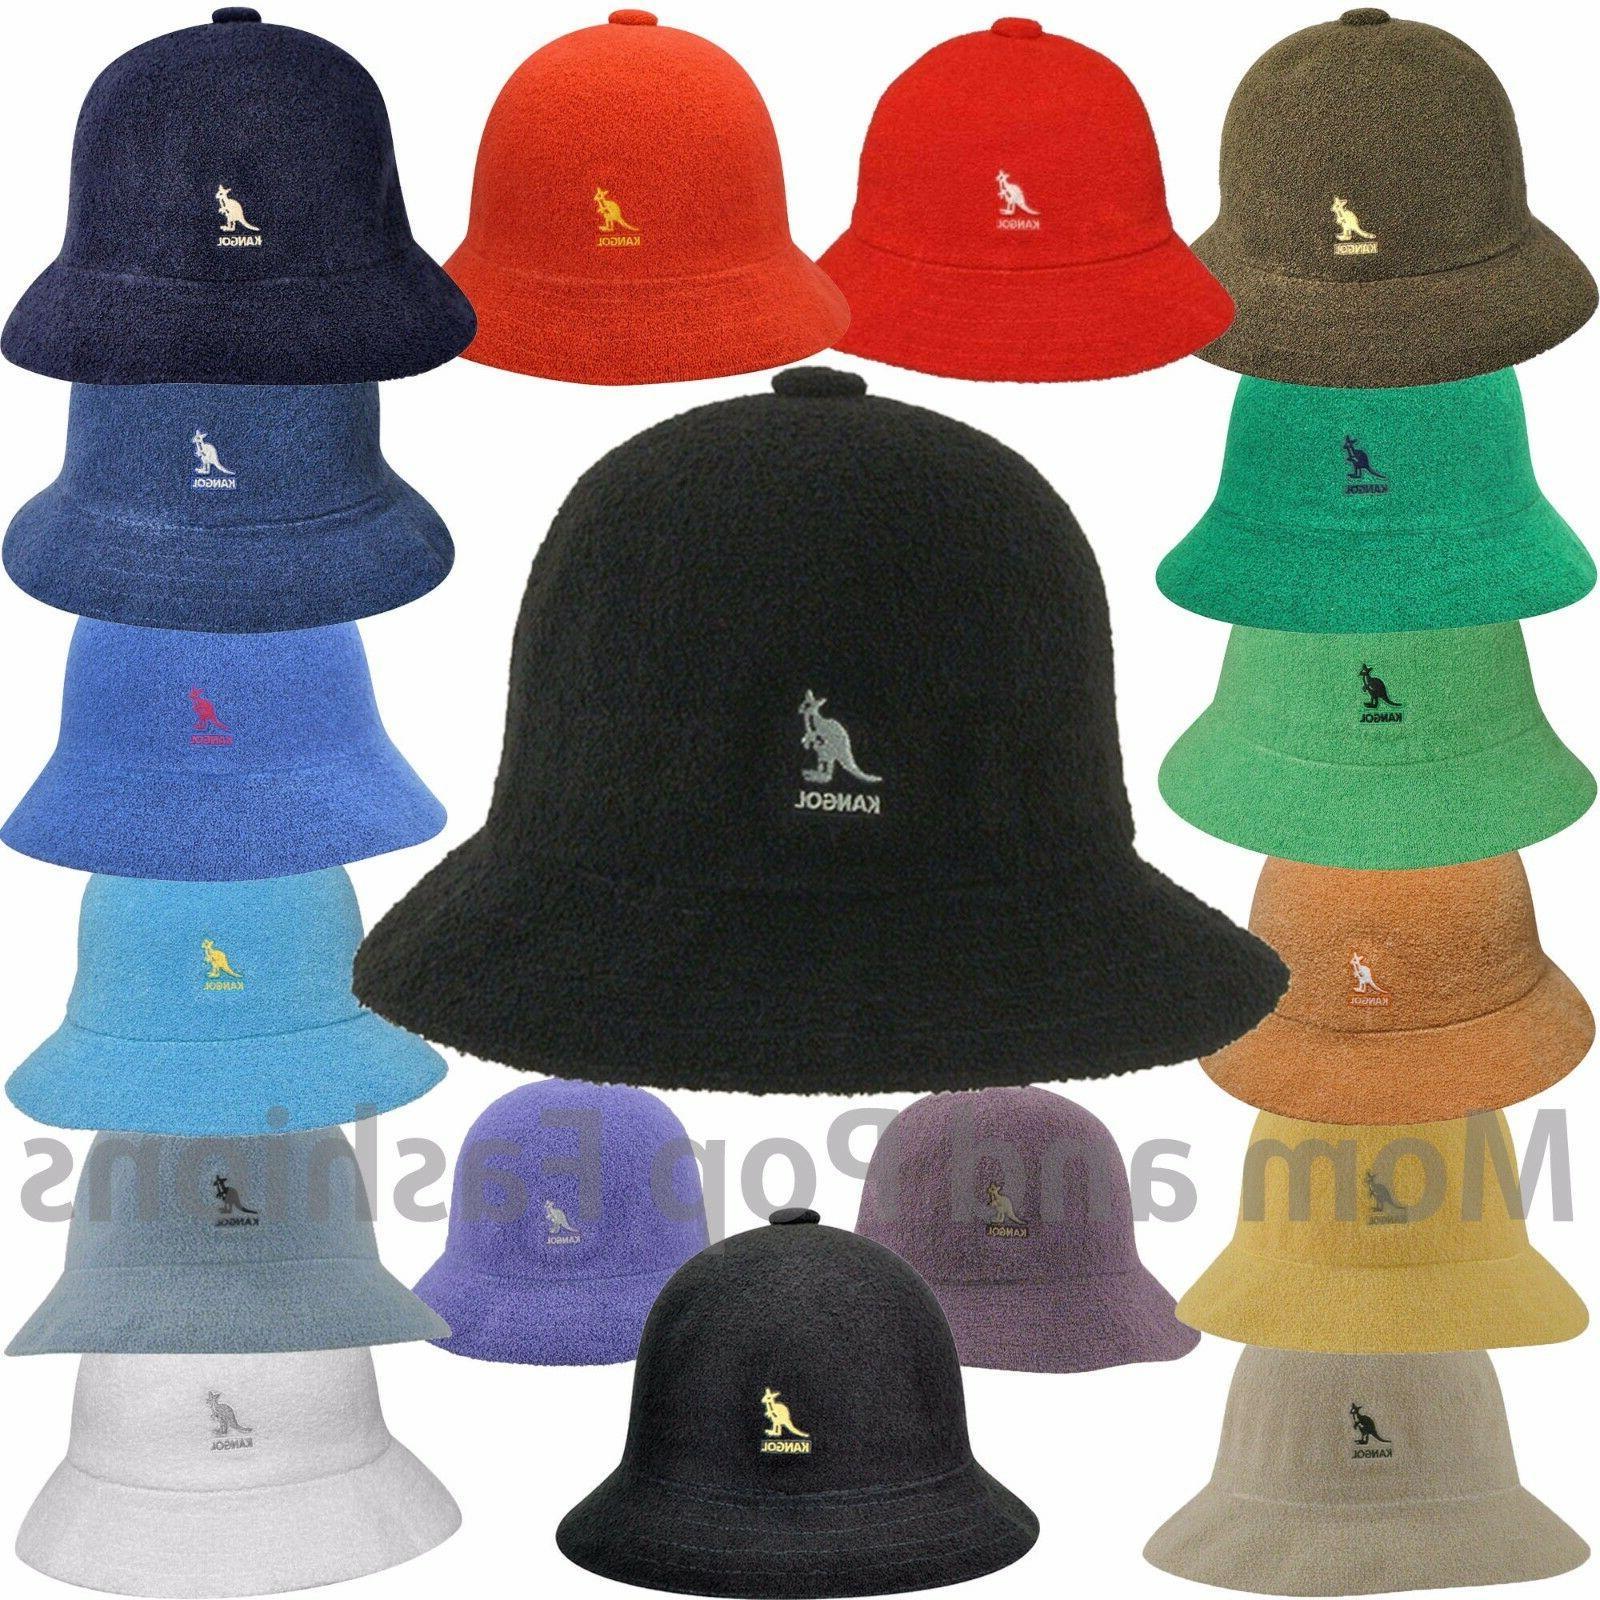 Authentic Kangol Bermuda Casual Bucket Hat Cap 0397BC S M L